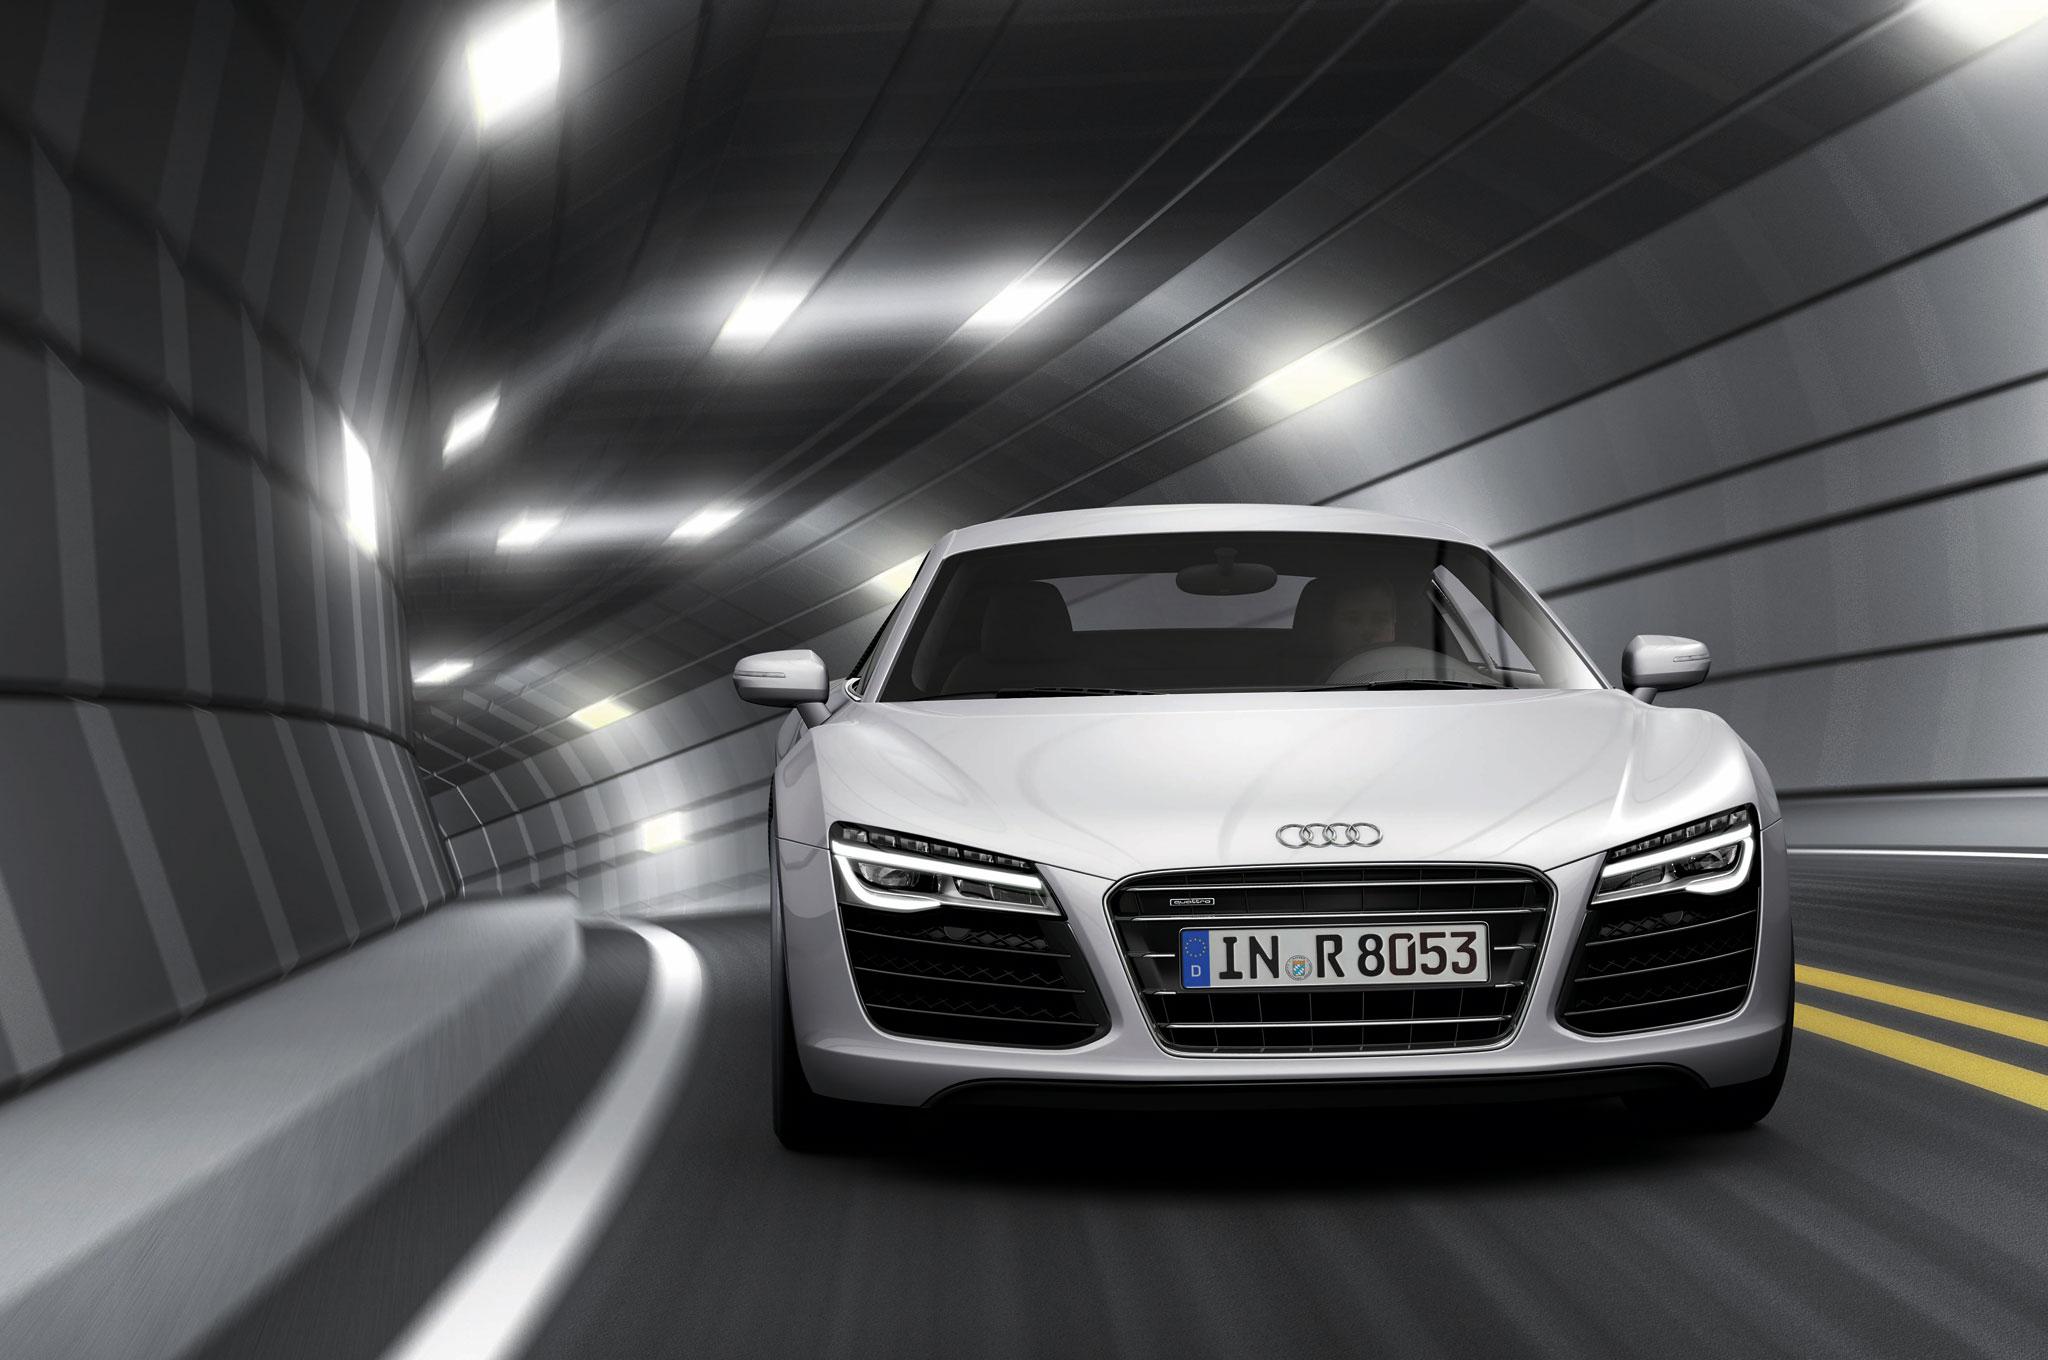 2014 Audi R8 Spyder, R8 V10 and R8 V10 Plus - Automobile Magazine